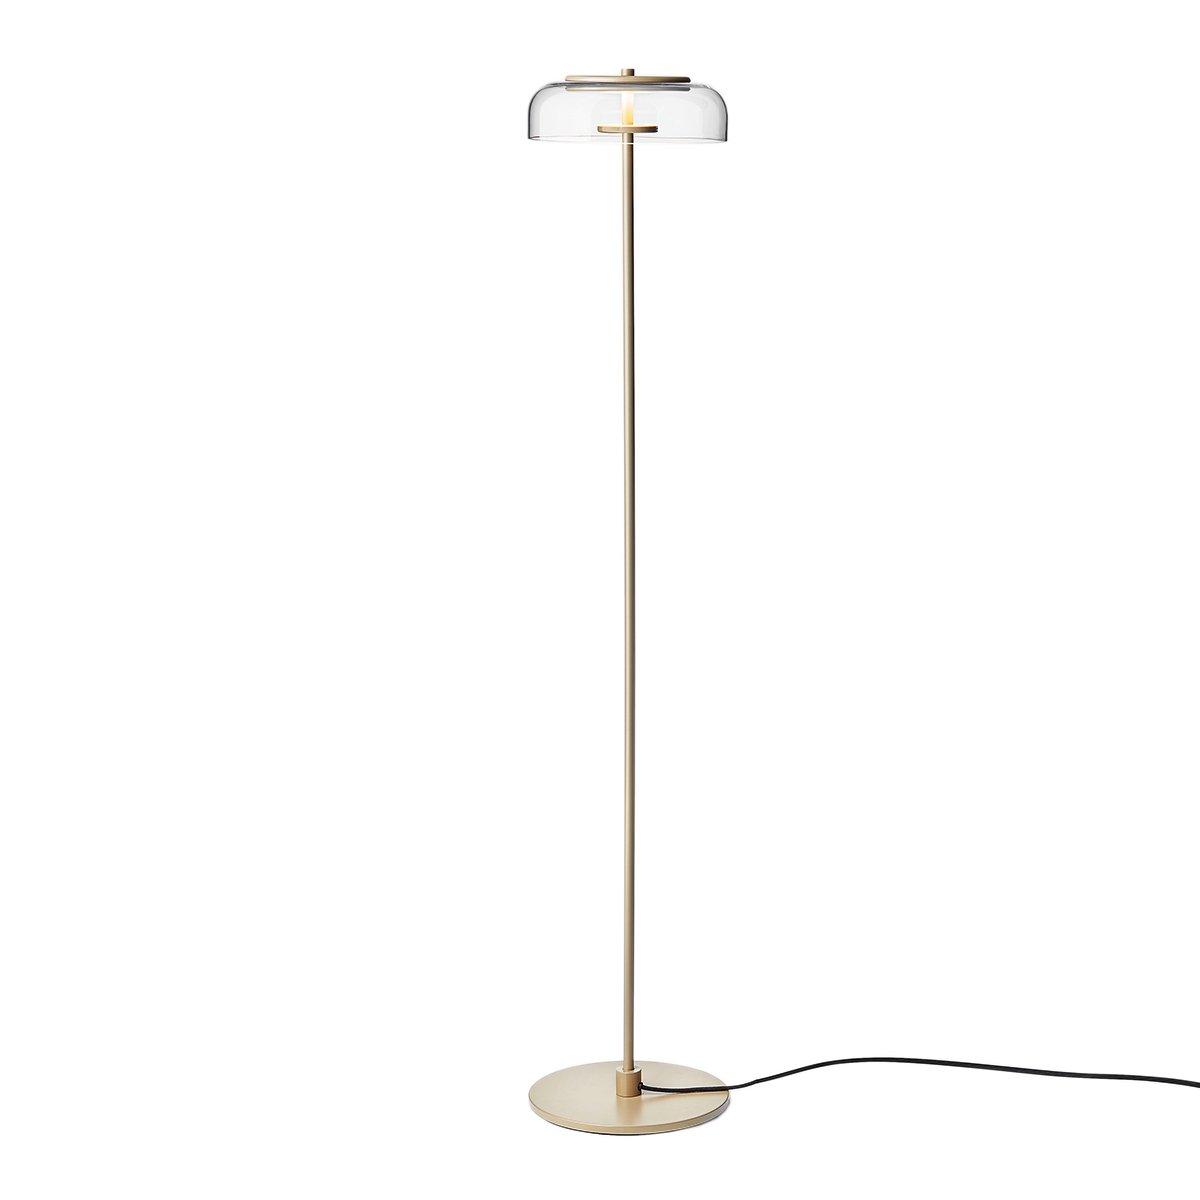 Nuura Blossi Vloerlamp �23 cm. - Nordic Gold - Clear